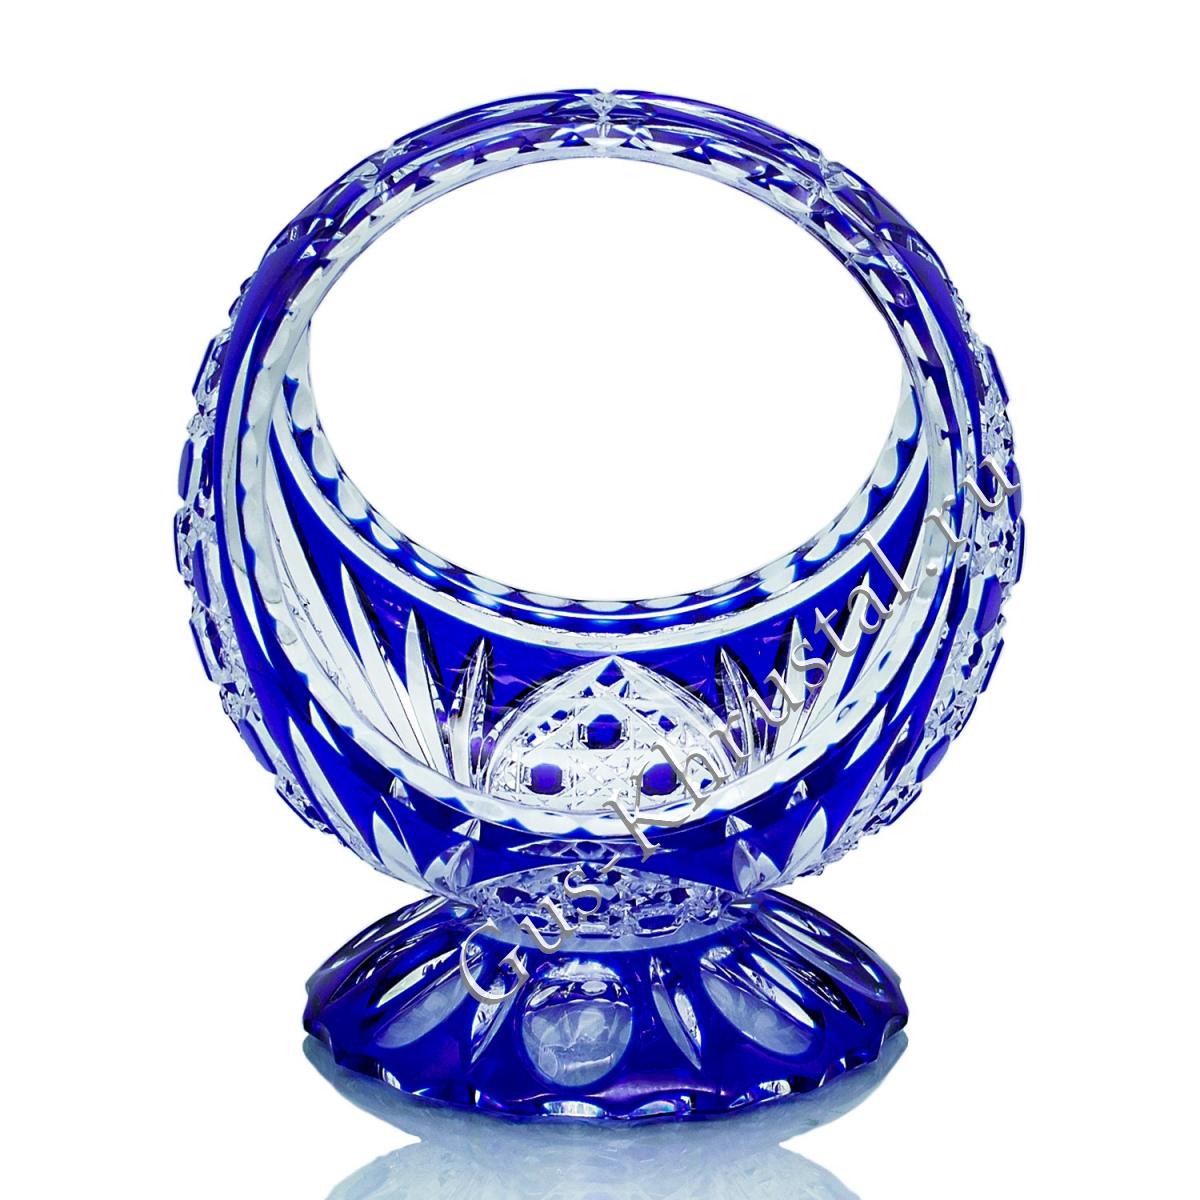 Ваза Корзинка Хрустальная на Подставке синяя малая